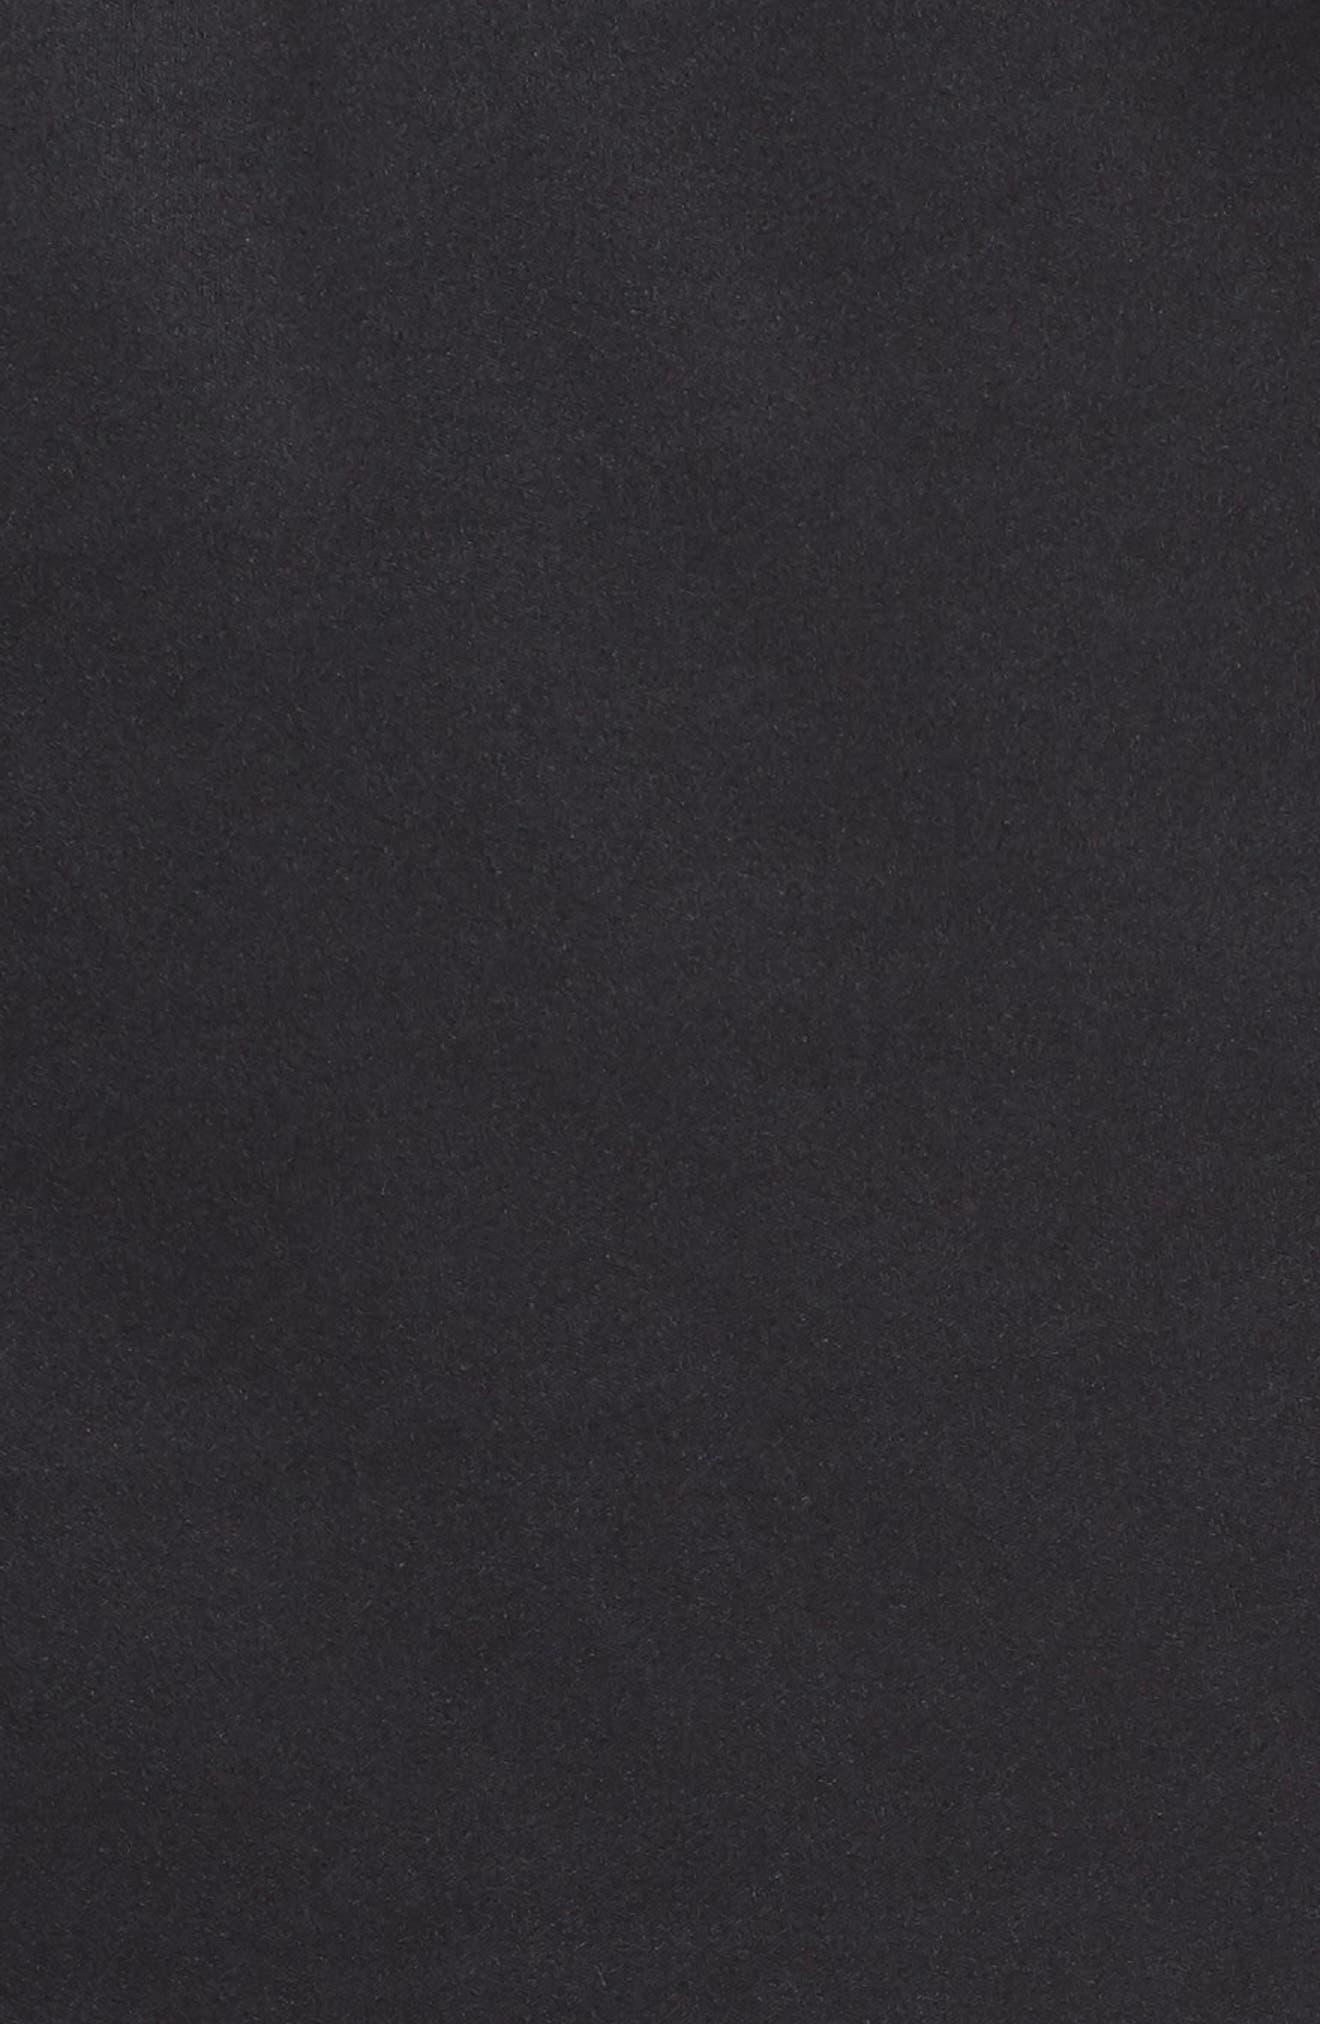 ,                             Therma Sphere Training Pants,                             Alternate thumbnail 6, color,                             BLACK/ ANTHRACITE/ HEMATITE